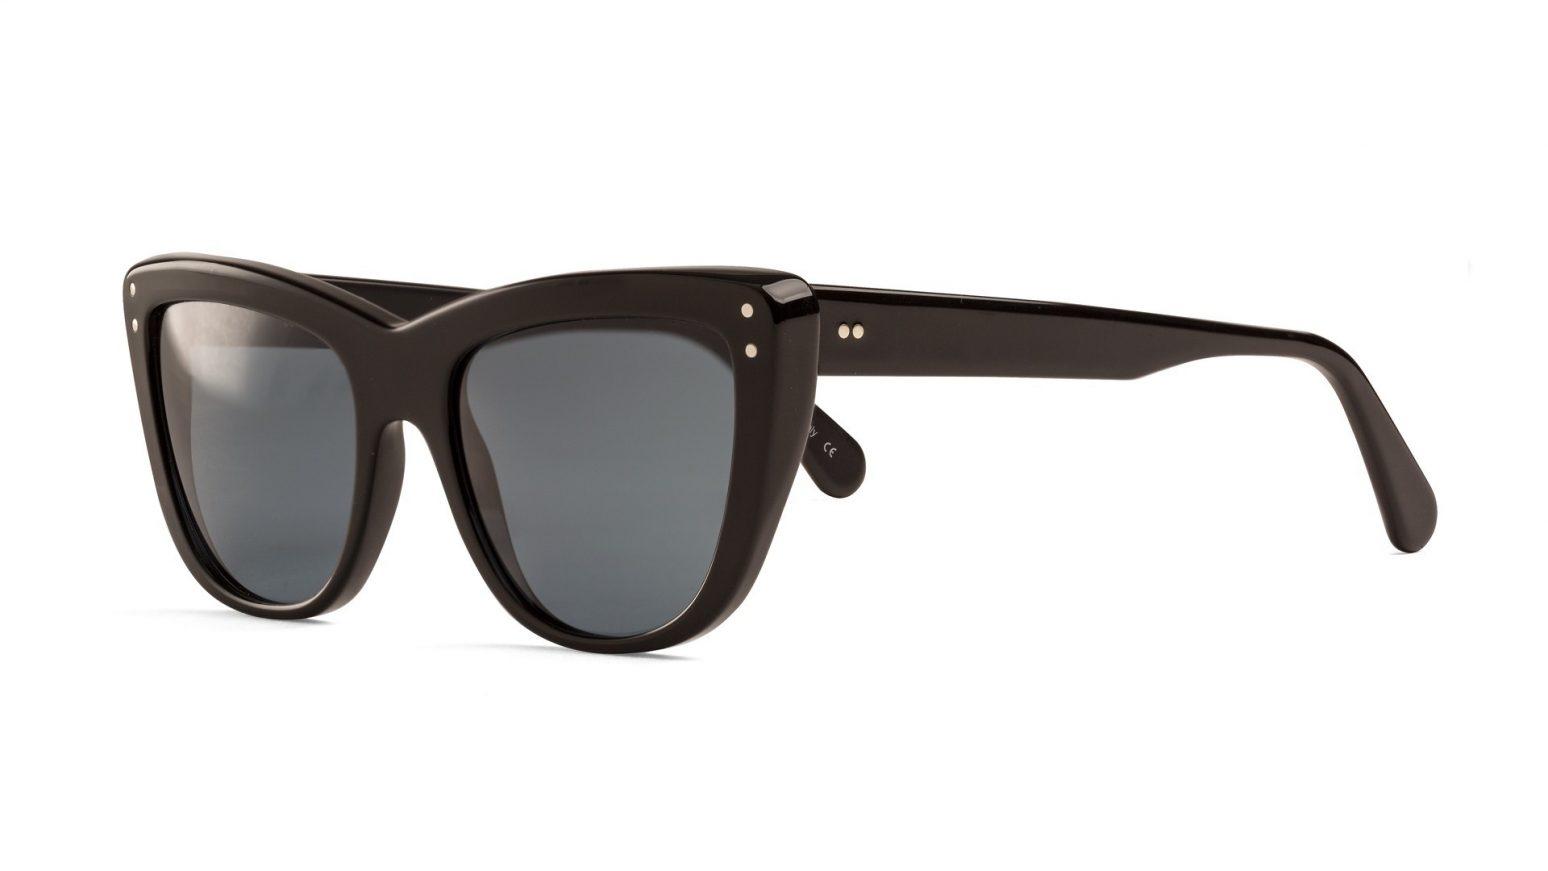 Raval Eyewear-Optica Gran Via Barcelona